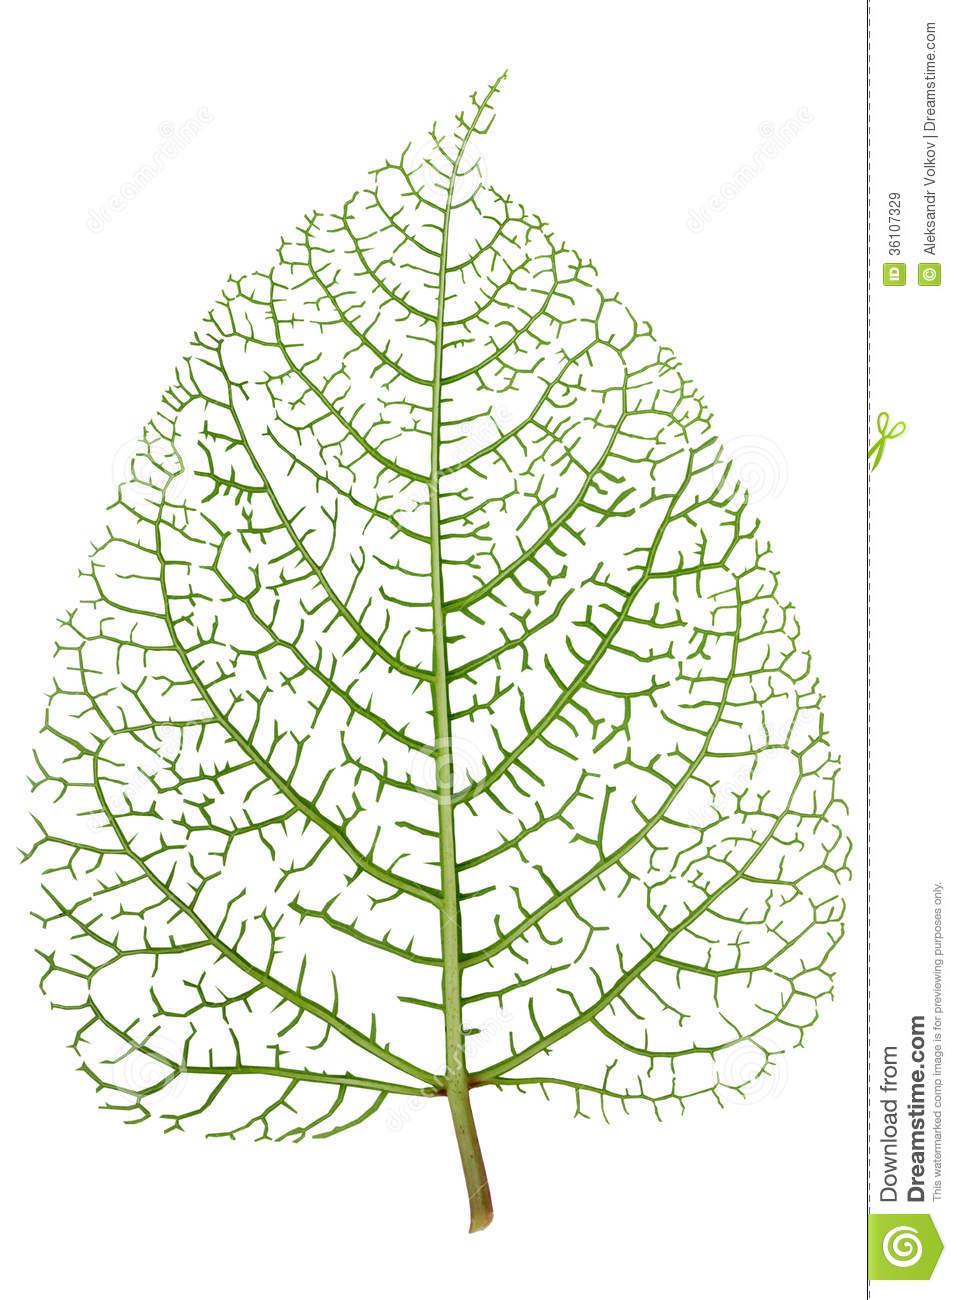 Leaf Skeleton Veins Royalty Free Stock Images.